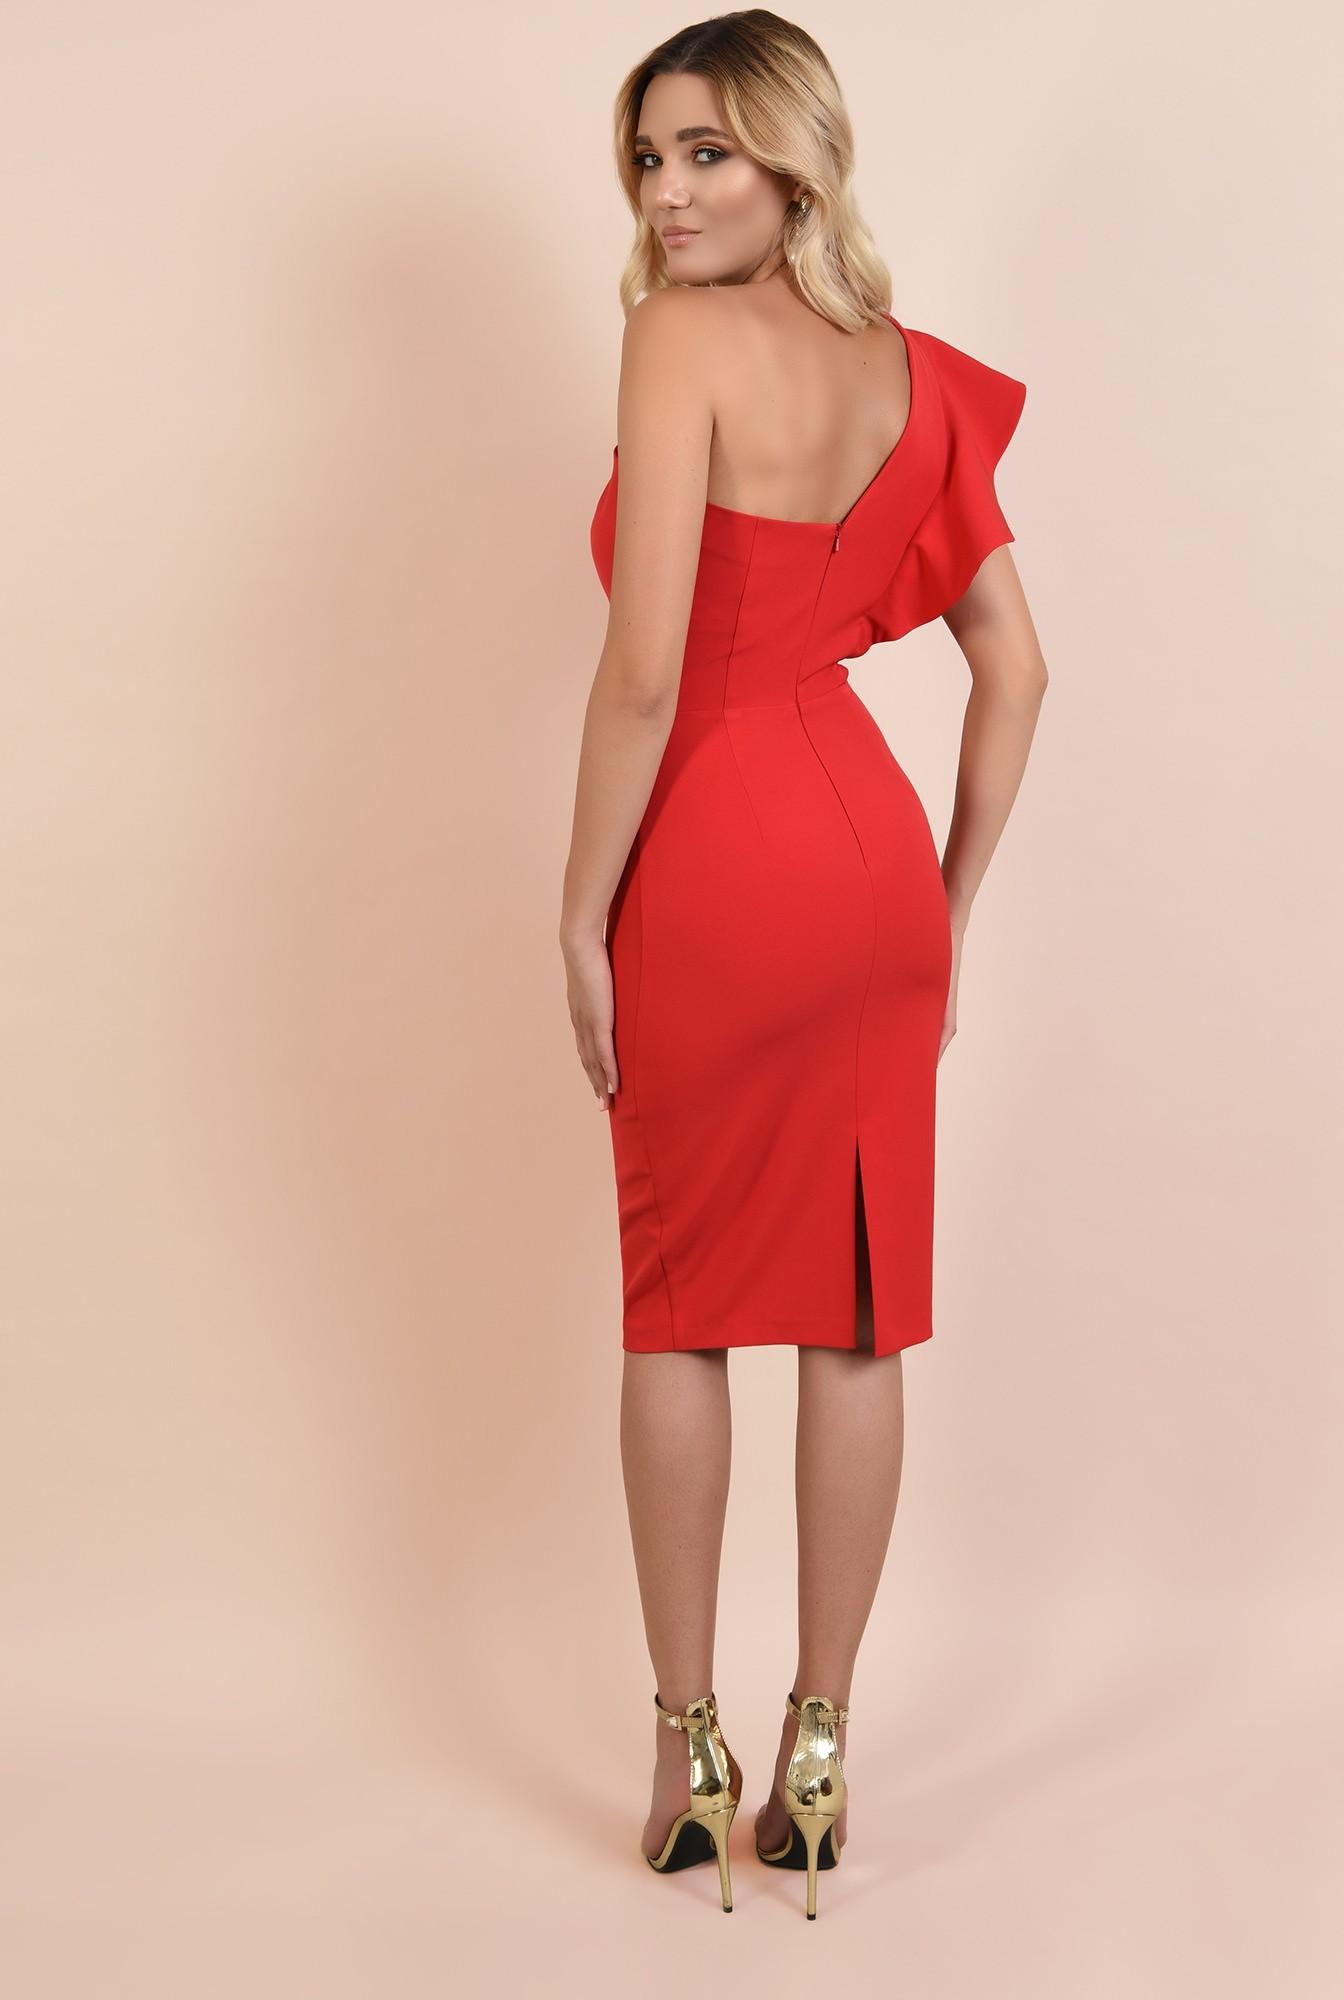 1 - 360 - rochie rosie, de ocazie, midi, conica, decolteu inima